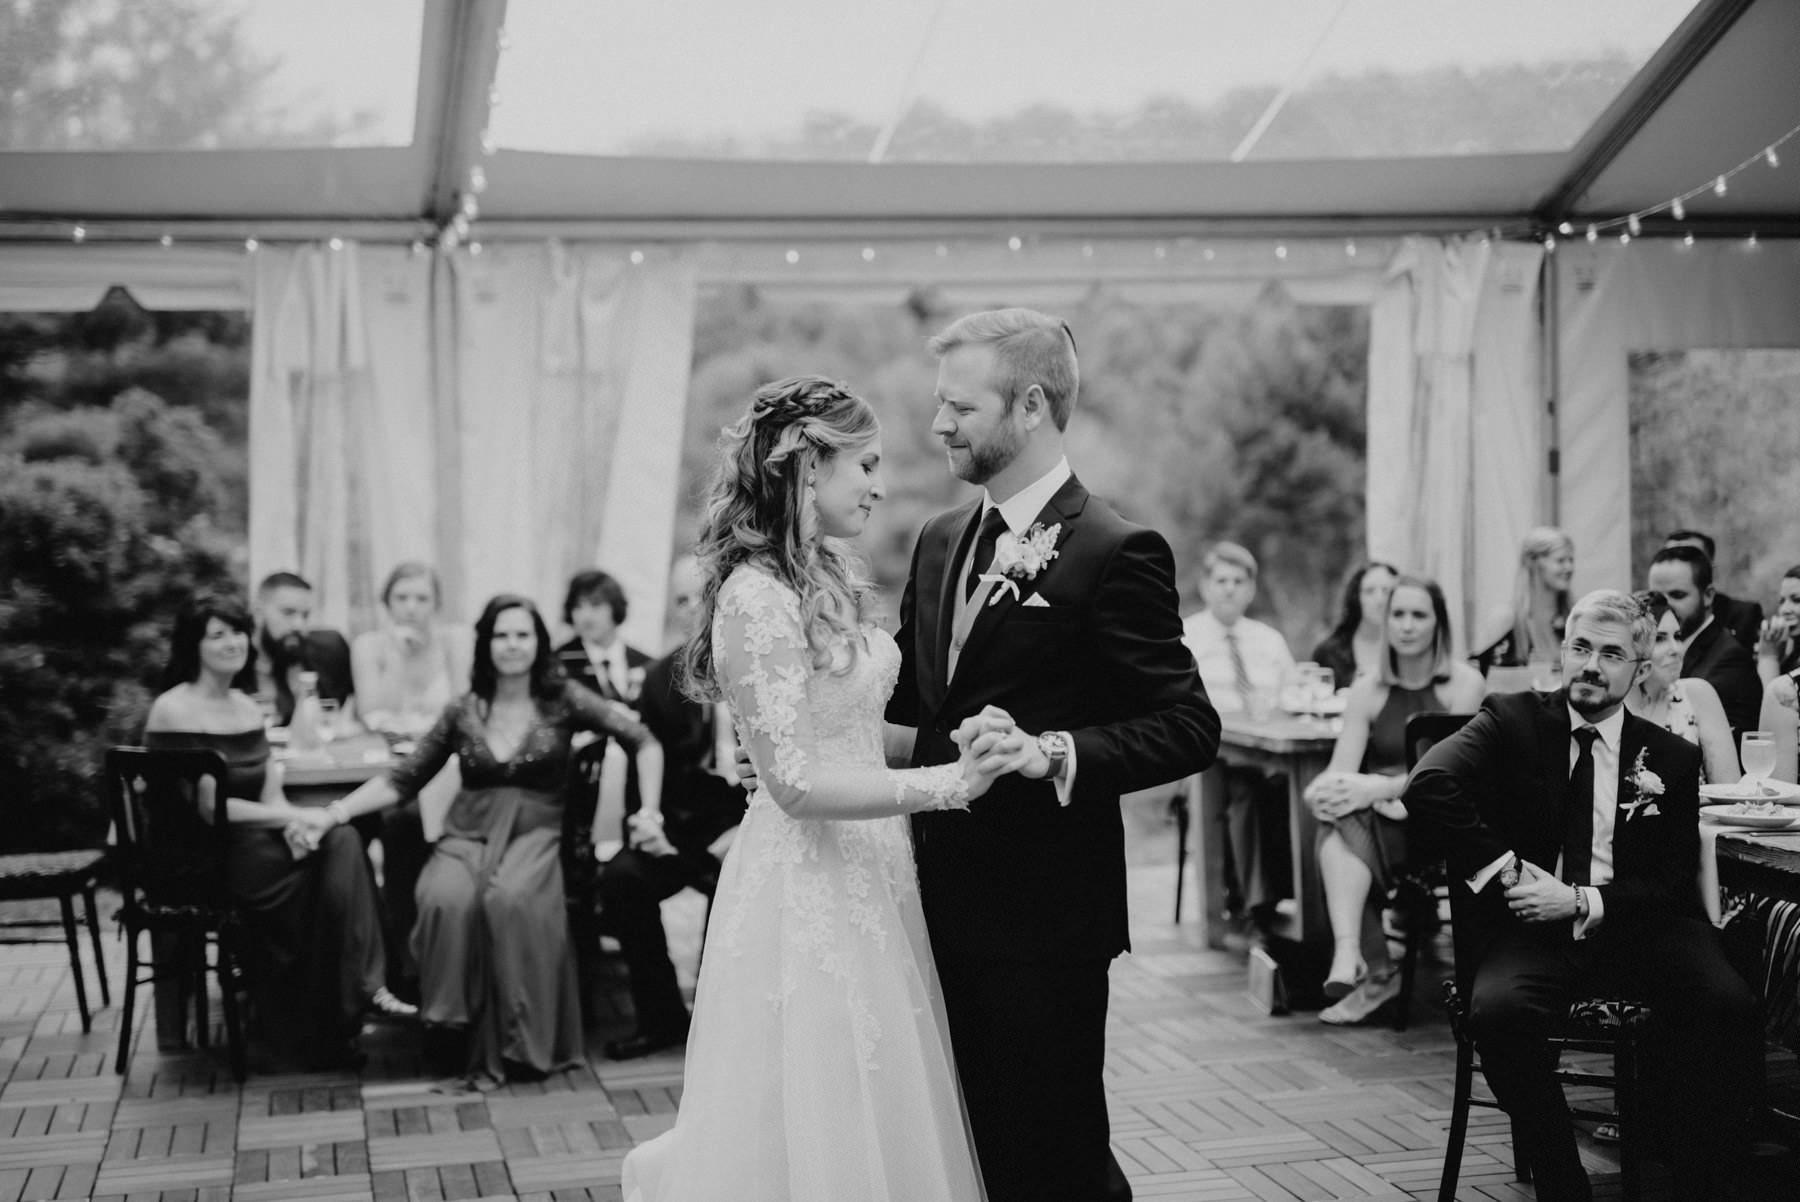 welkinweir-wedding-photography-52.jpg